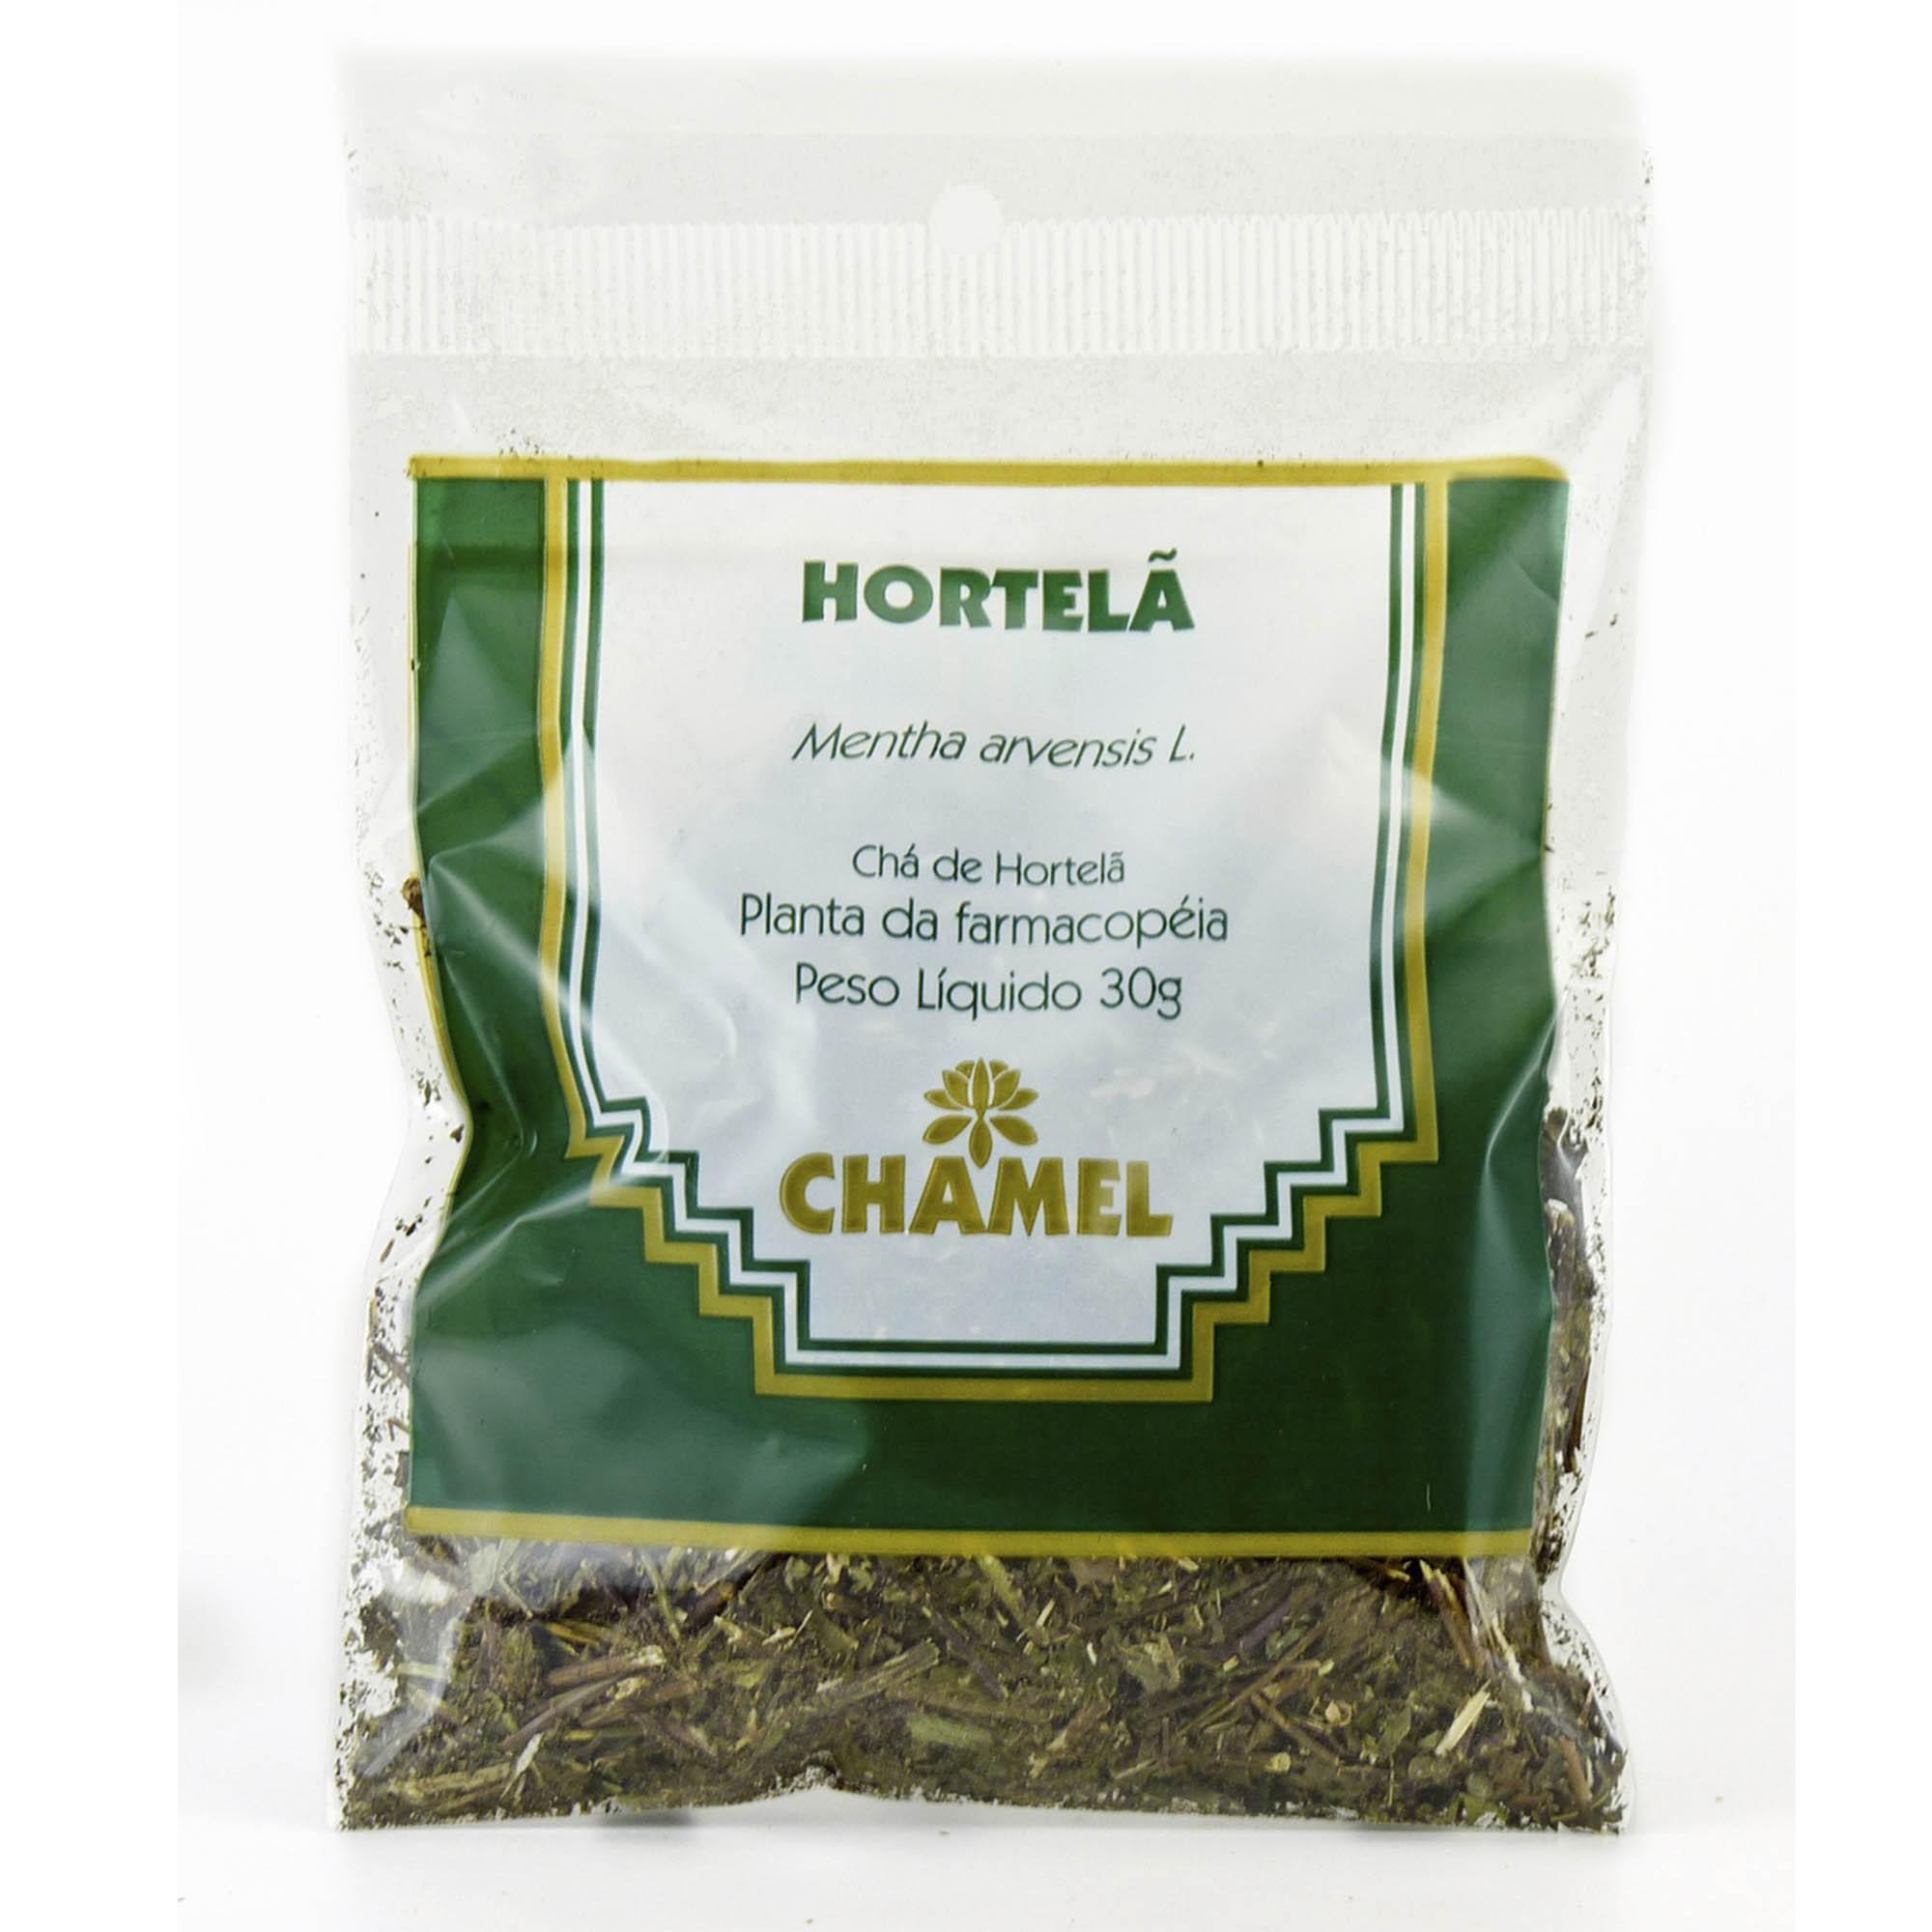 Hortelã Pimenta 30g Chamel - Chá-Folhas